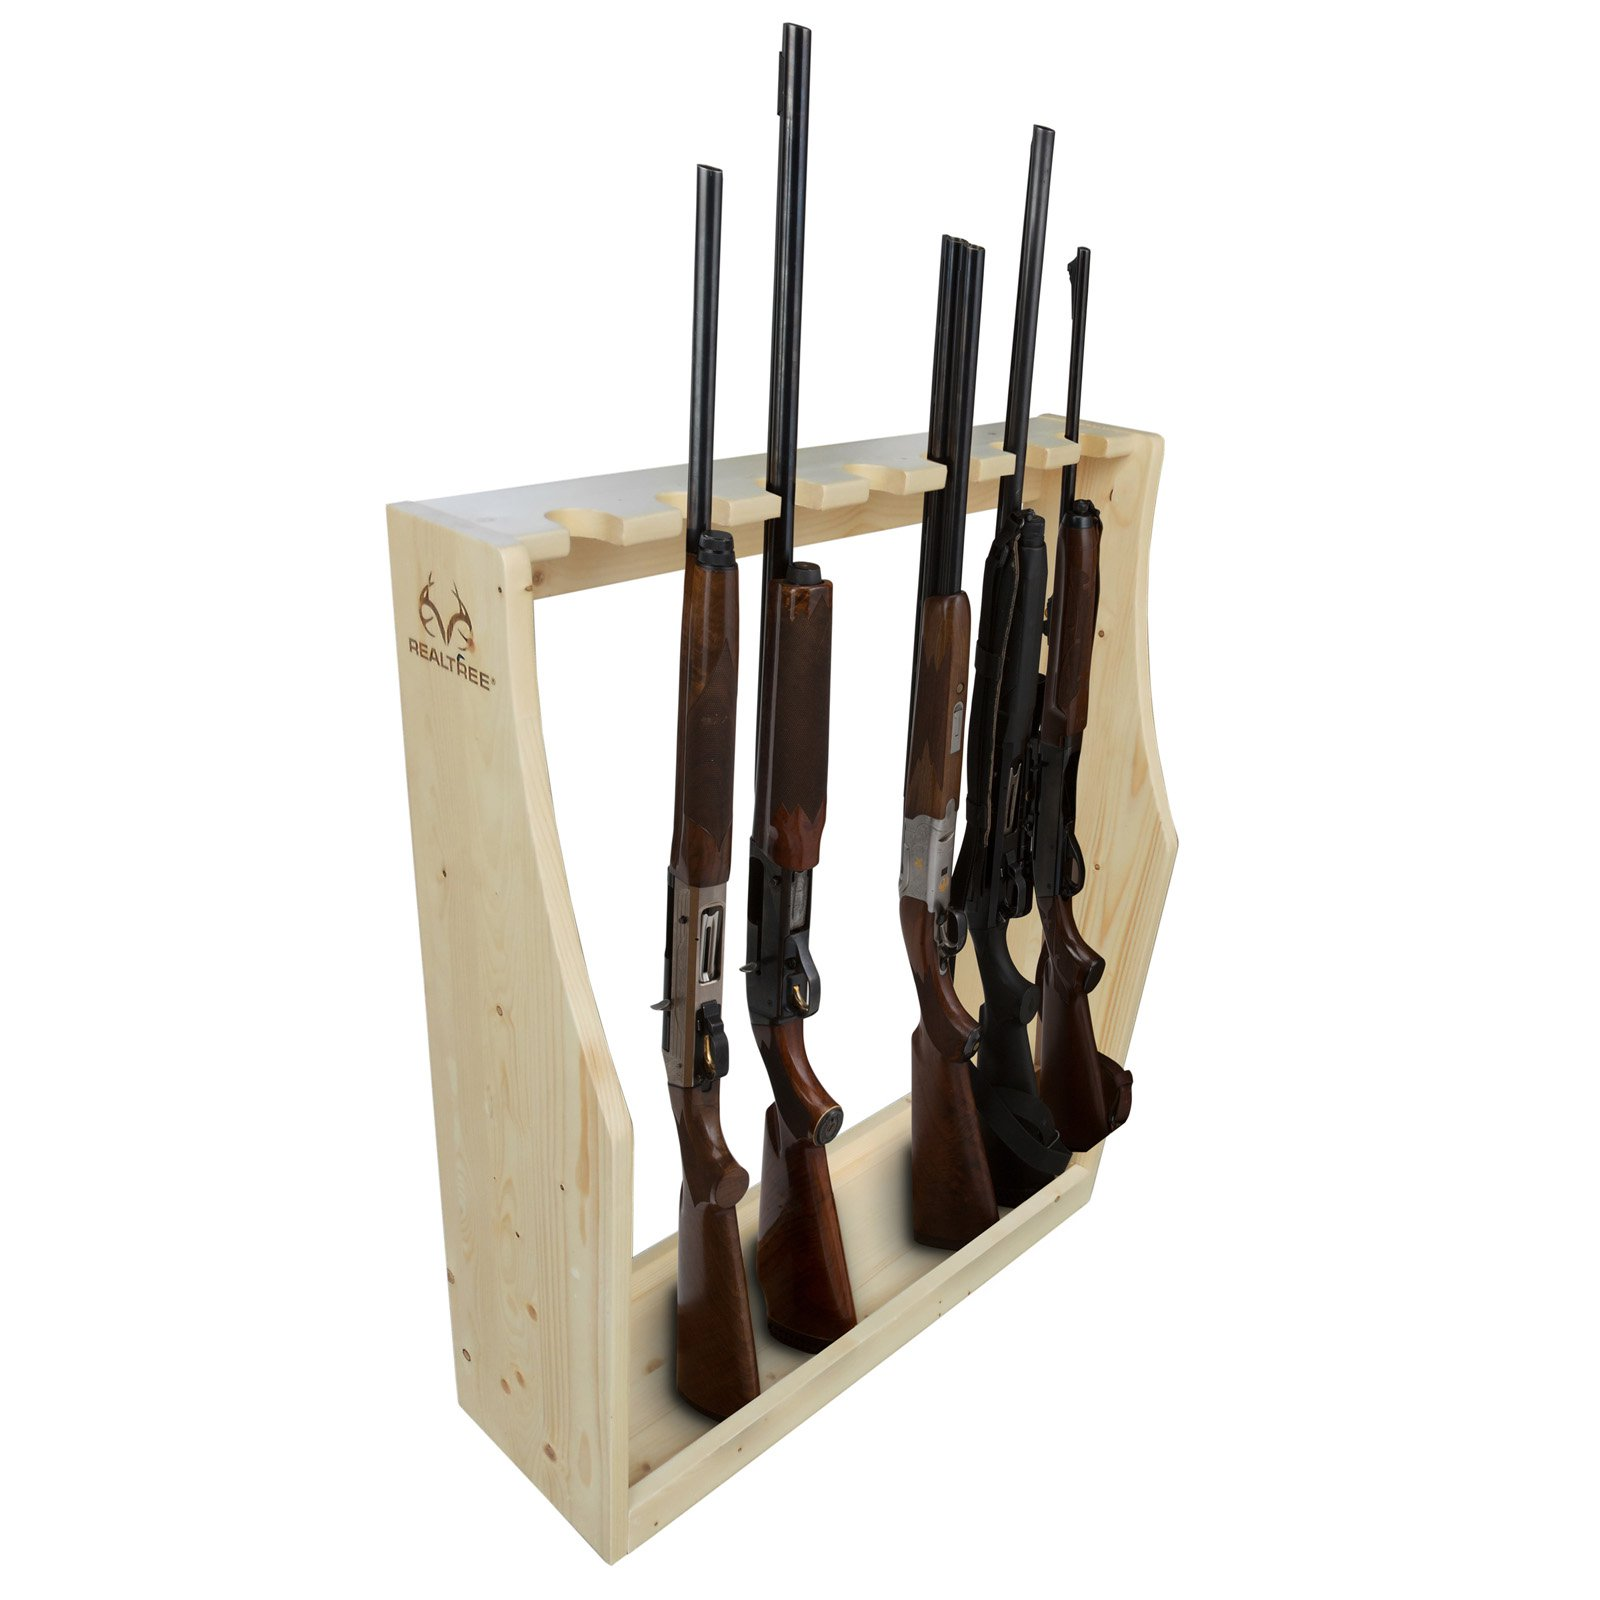 realtree solid pine 7 gun floor storage rack heavy duty construction